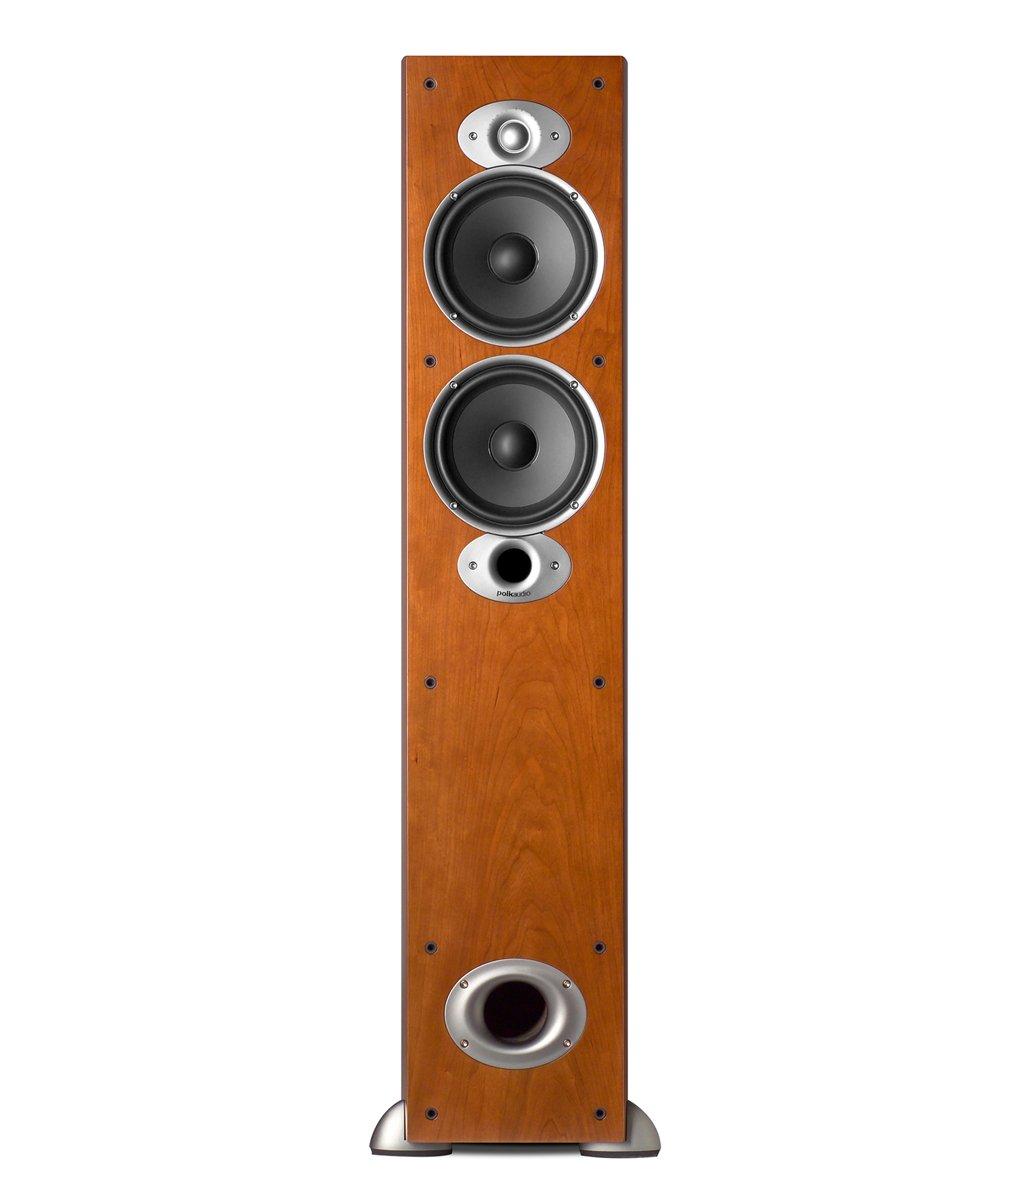 Polk Audio RTI A5 Floorstanding Speaker (Single, Cherry) For $149.00 @ Amazon